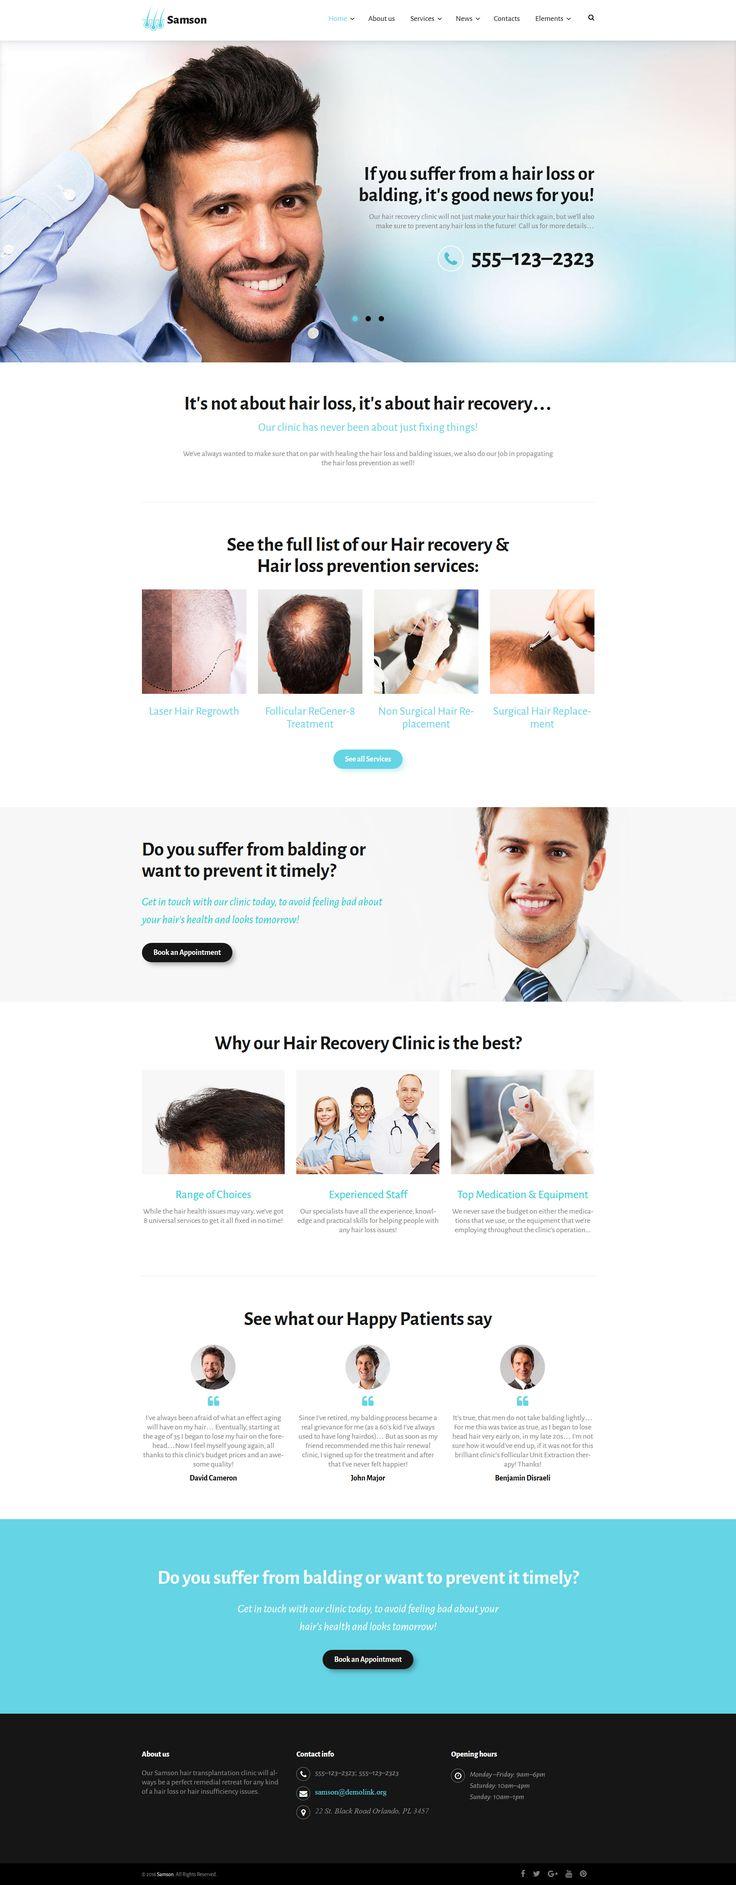 hair website templates